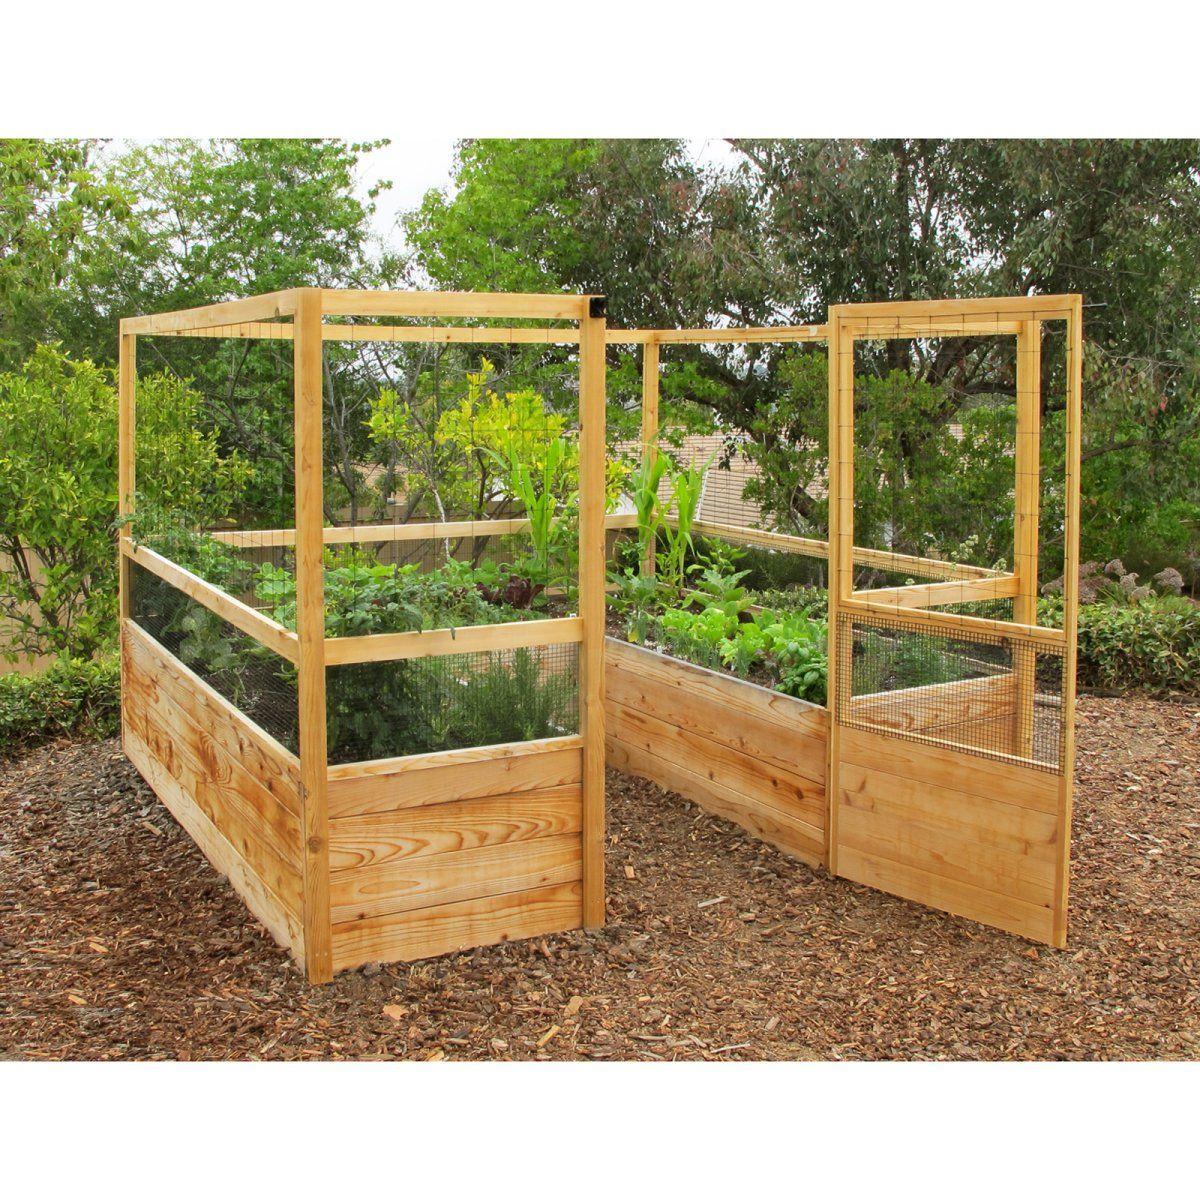 inuseMKIT006.jpg 1,200×1,200 pixels Garden bed kits